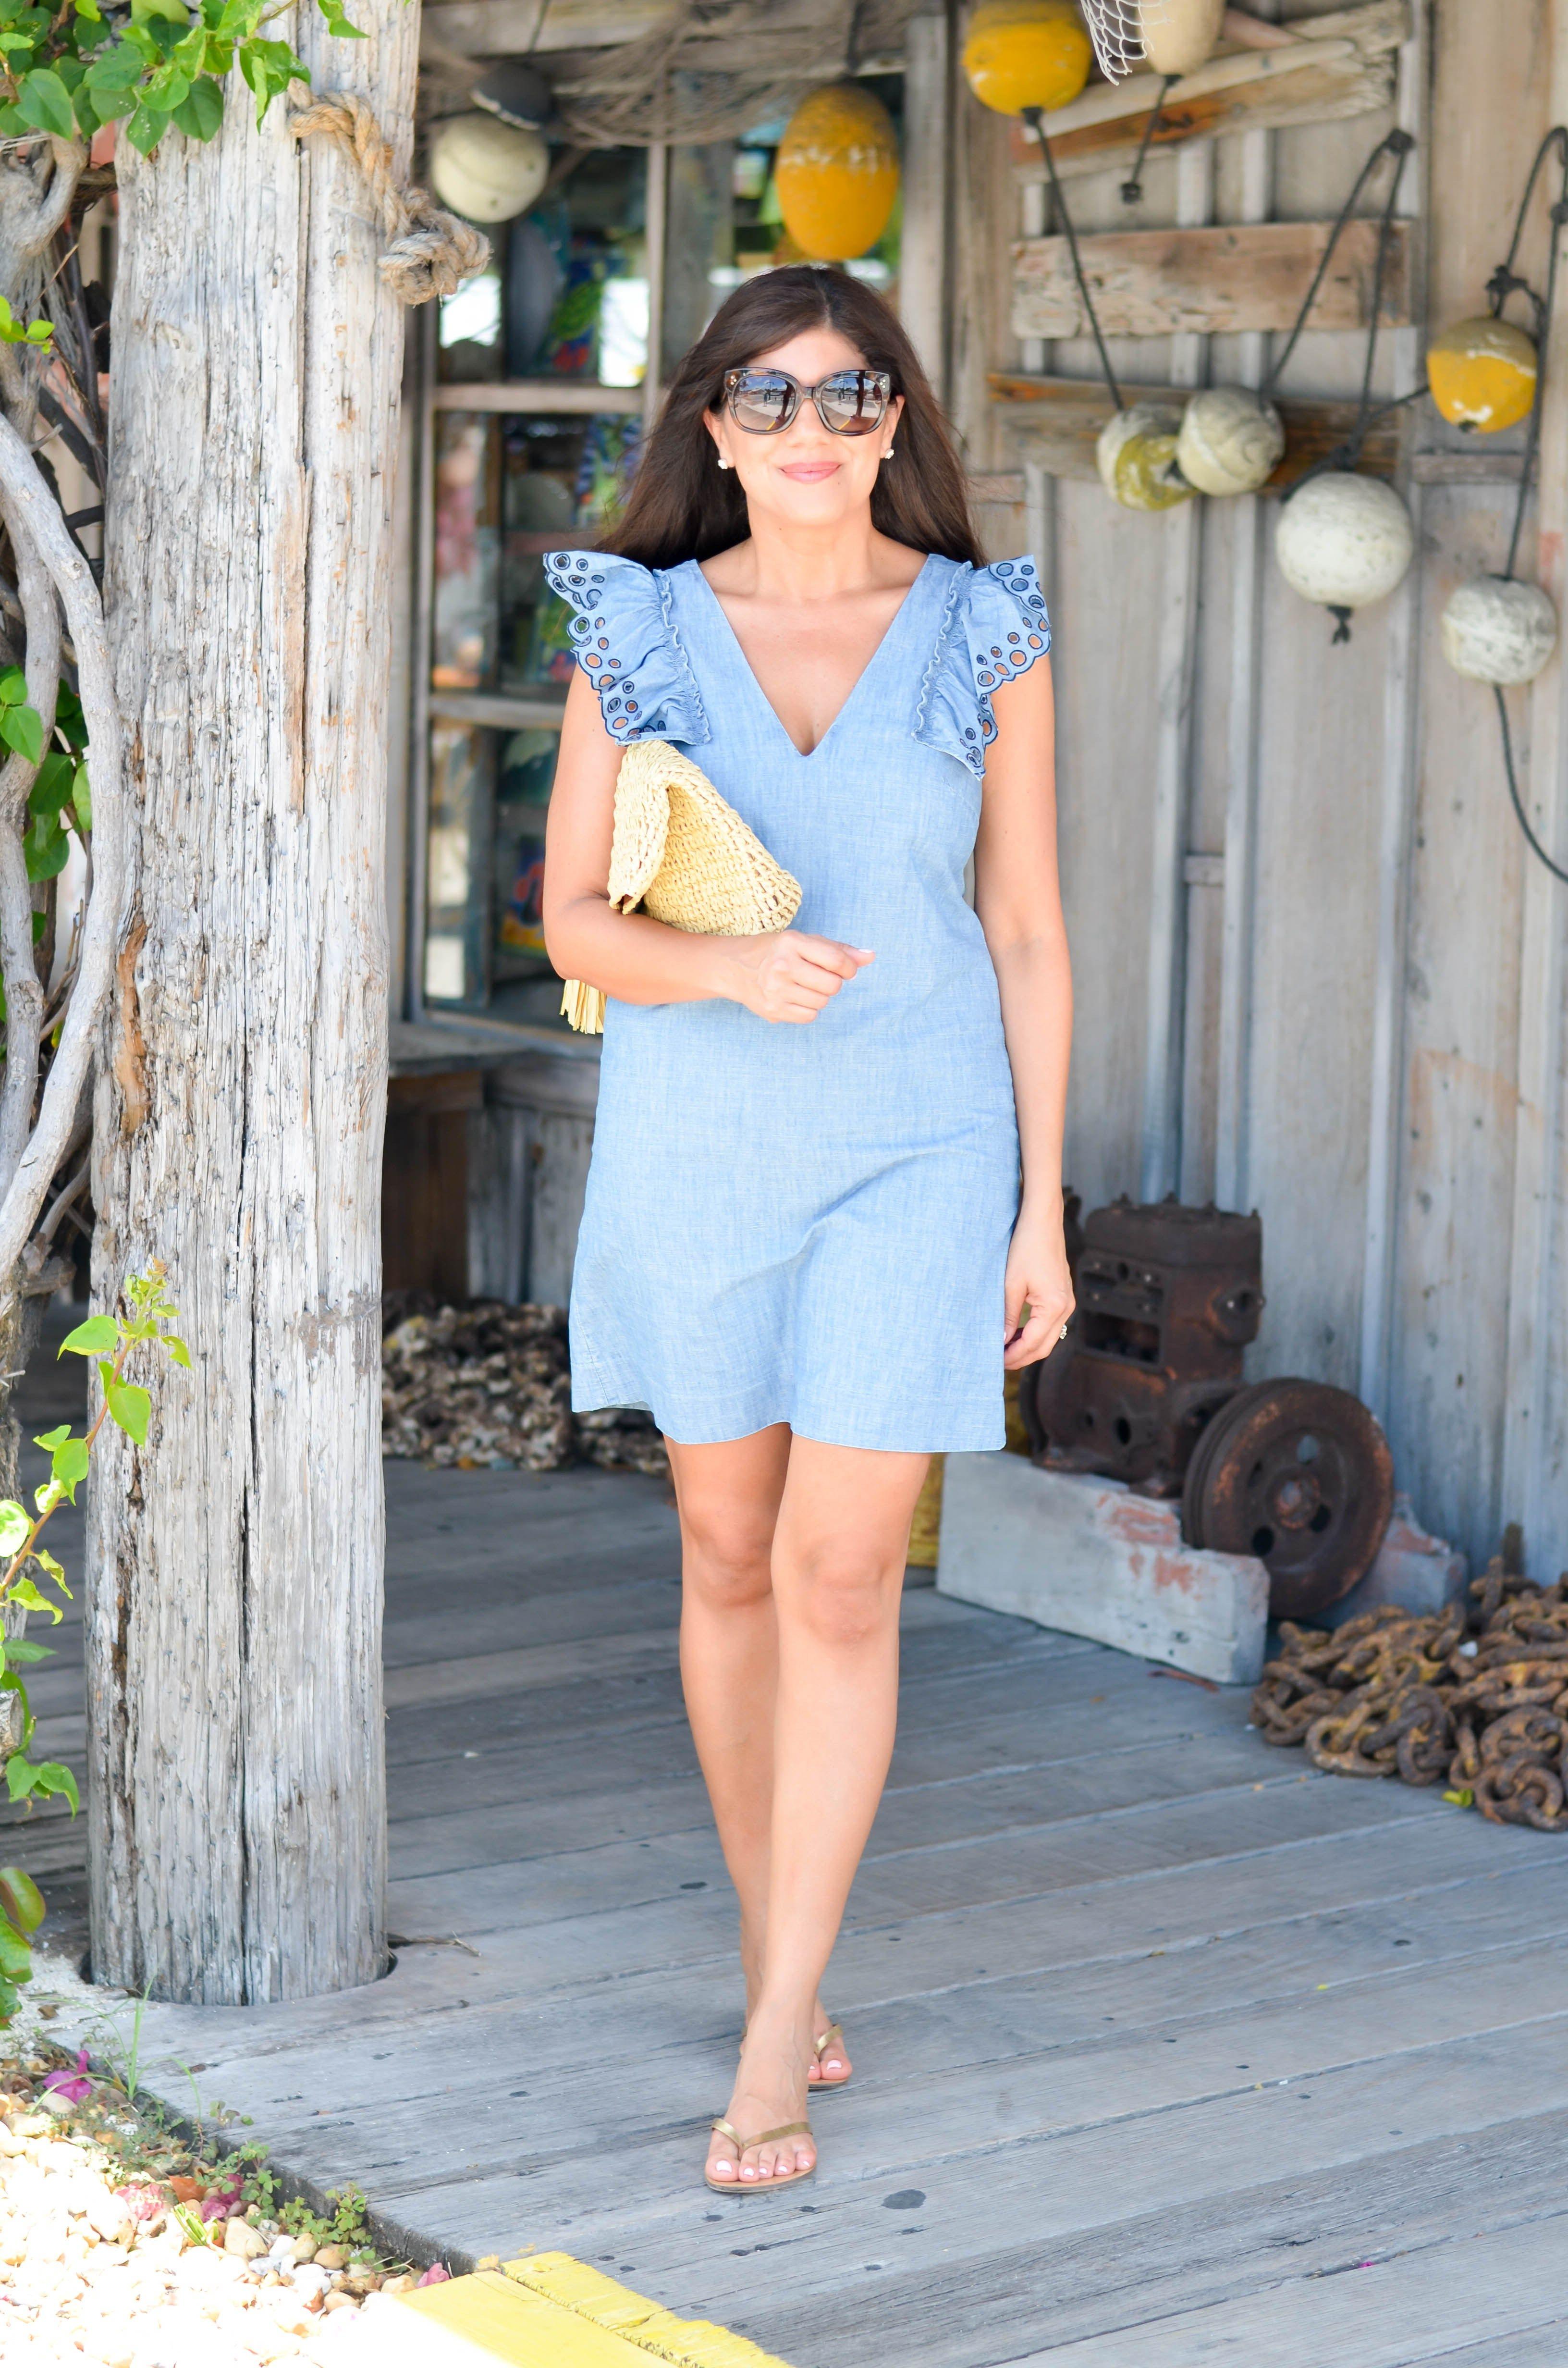 Summer Dress Series The Perfect Go To Sheath Dress Beautifully Seaside Dresses Sheath Dress Summer Dresses [ 4928 x 3264 Pixel ]